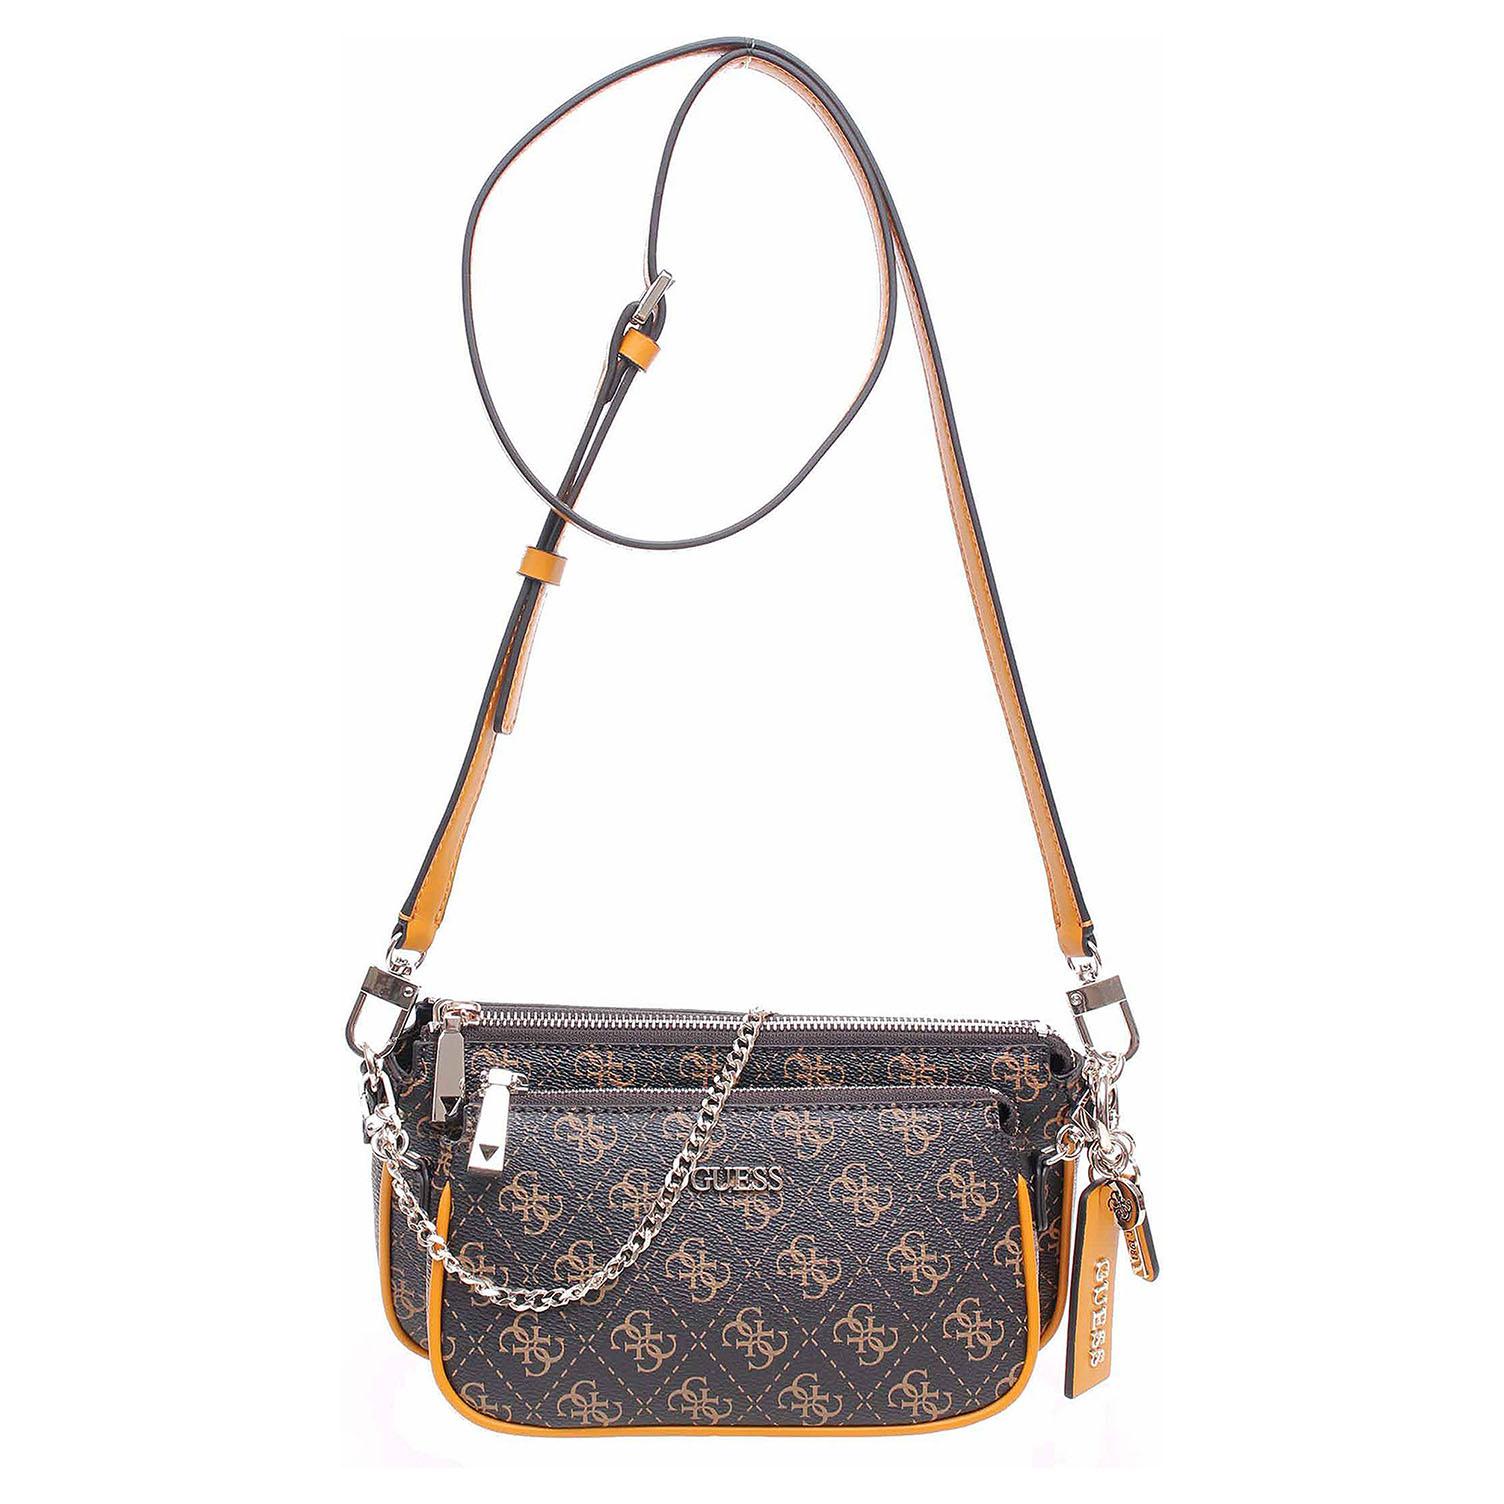 Guess dámská kabelka Arie Mini brown HWSG7885700 BRO 1